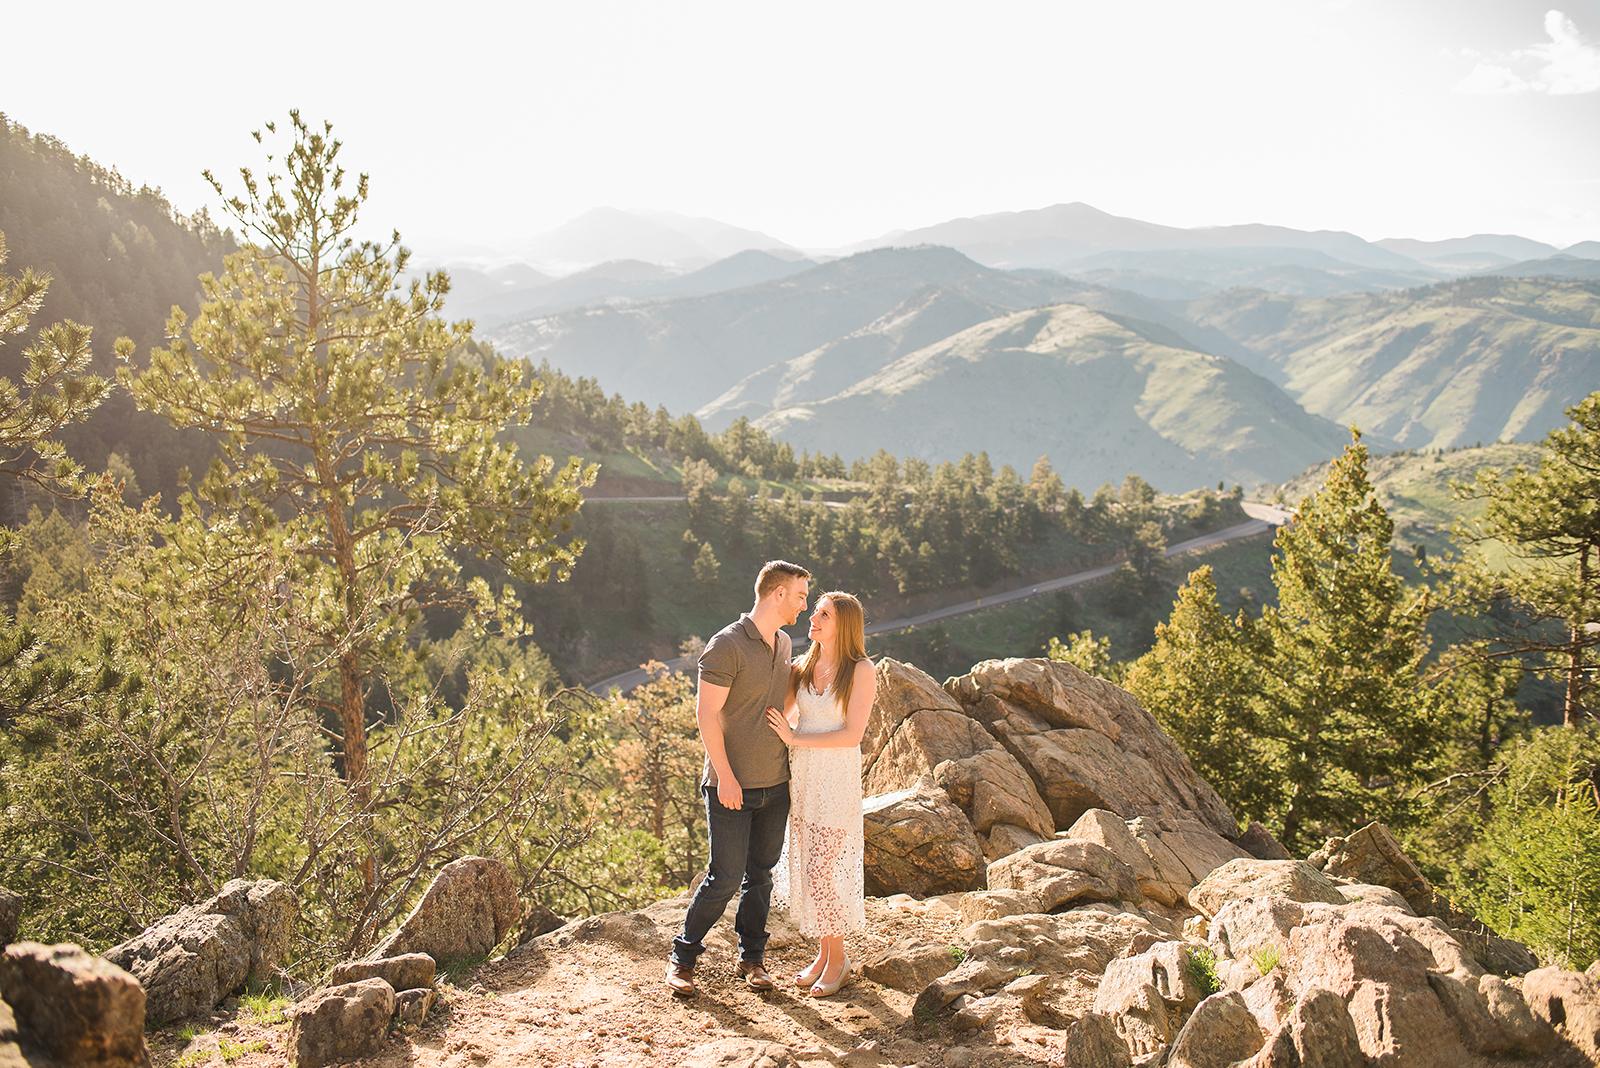 lookout-mountain-engagement-session-denver-engagement-photographer-20.jpg